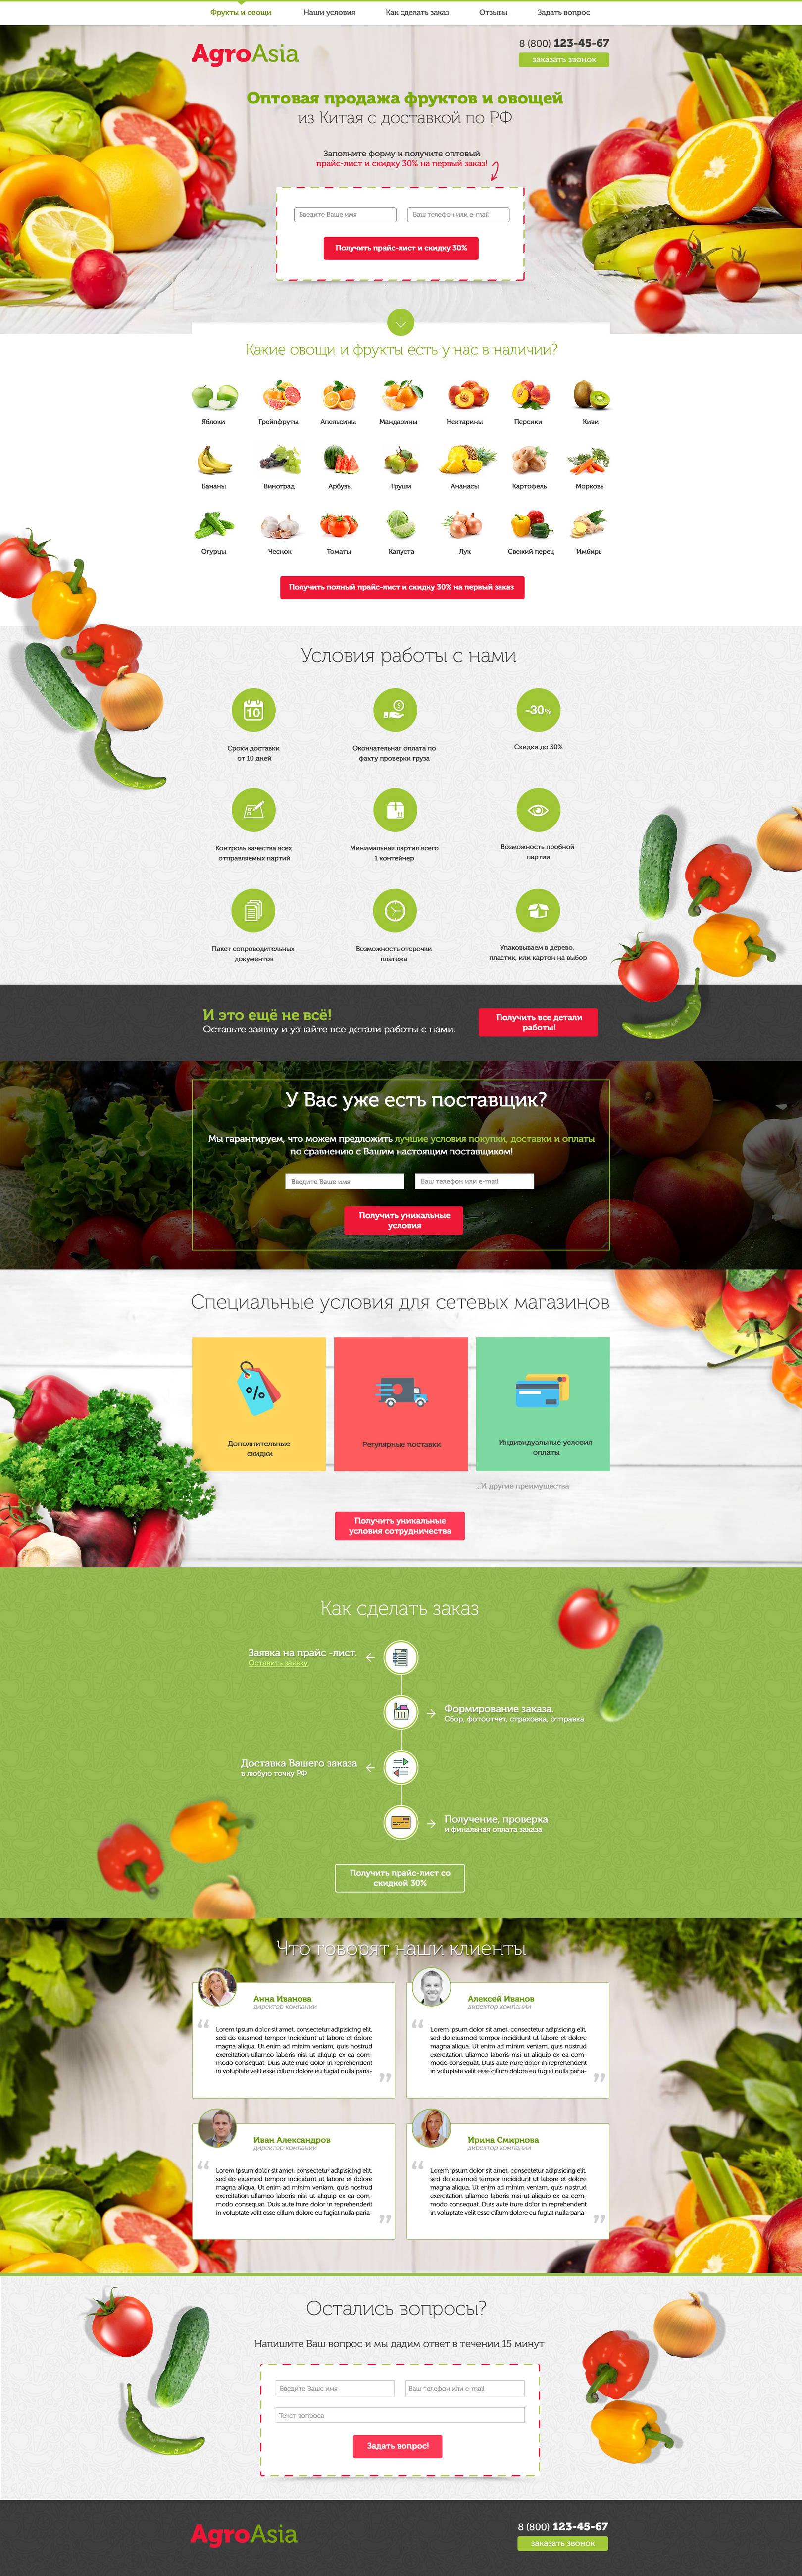 Landing page for vegetables sale.